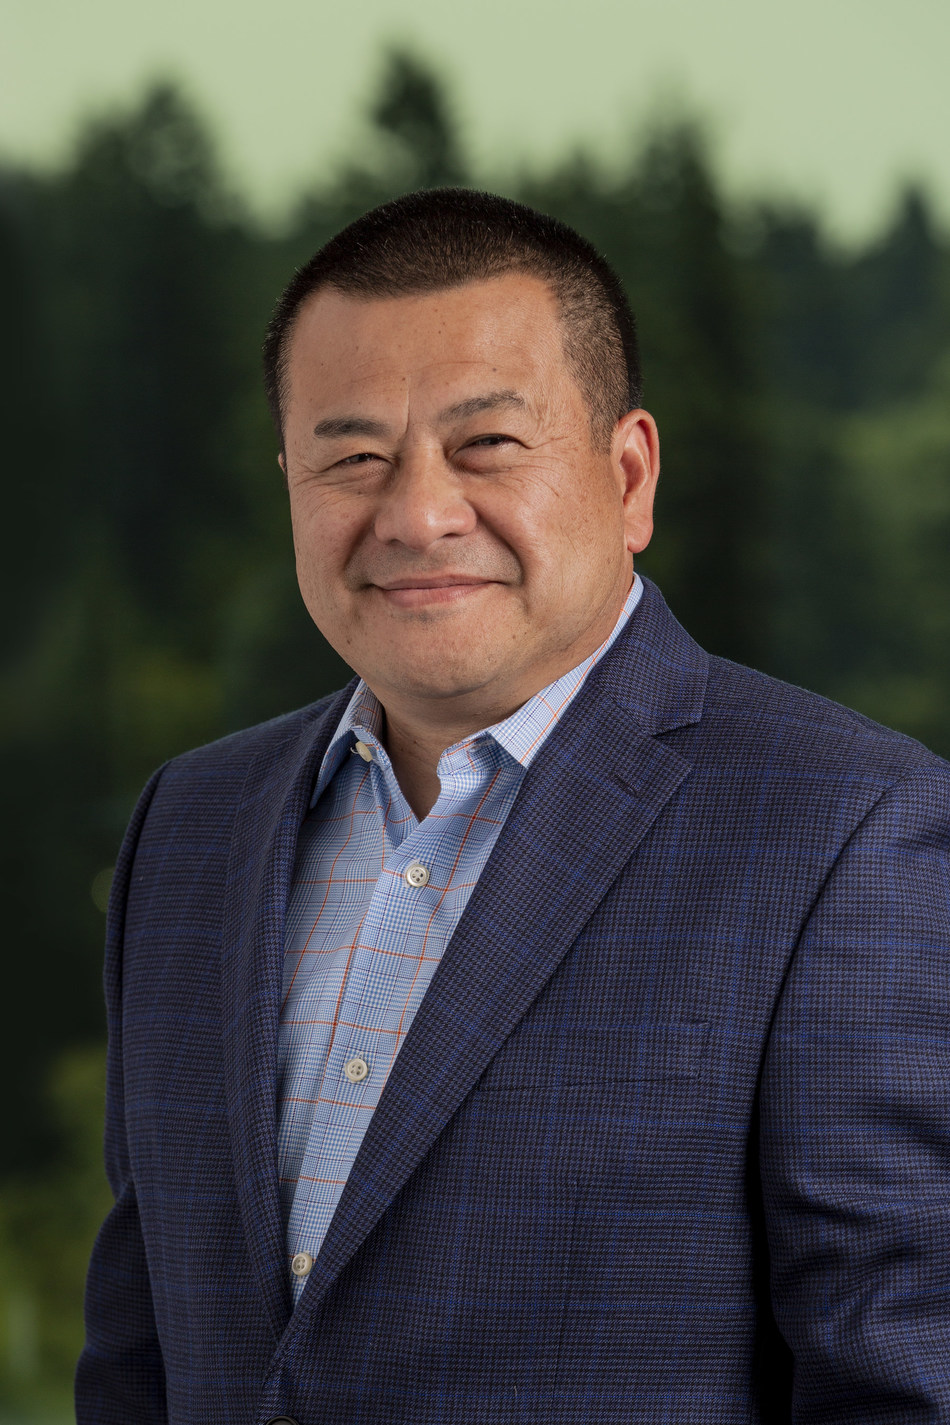 Kai Hsiao, chief executive officer of Eclipse Senior Living